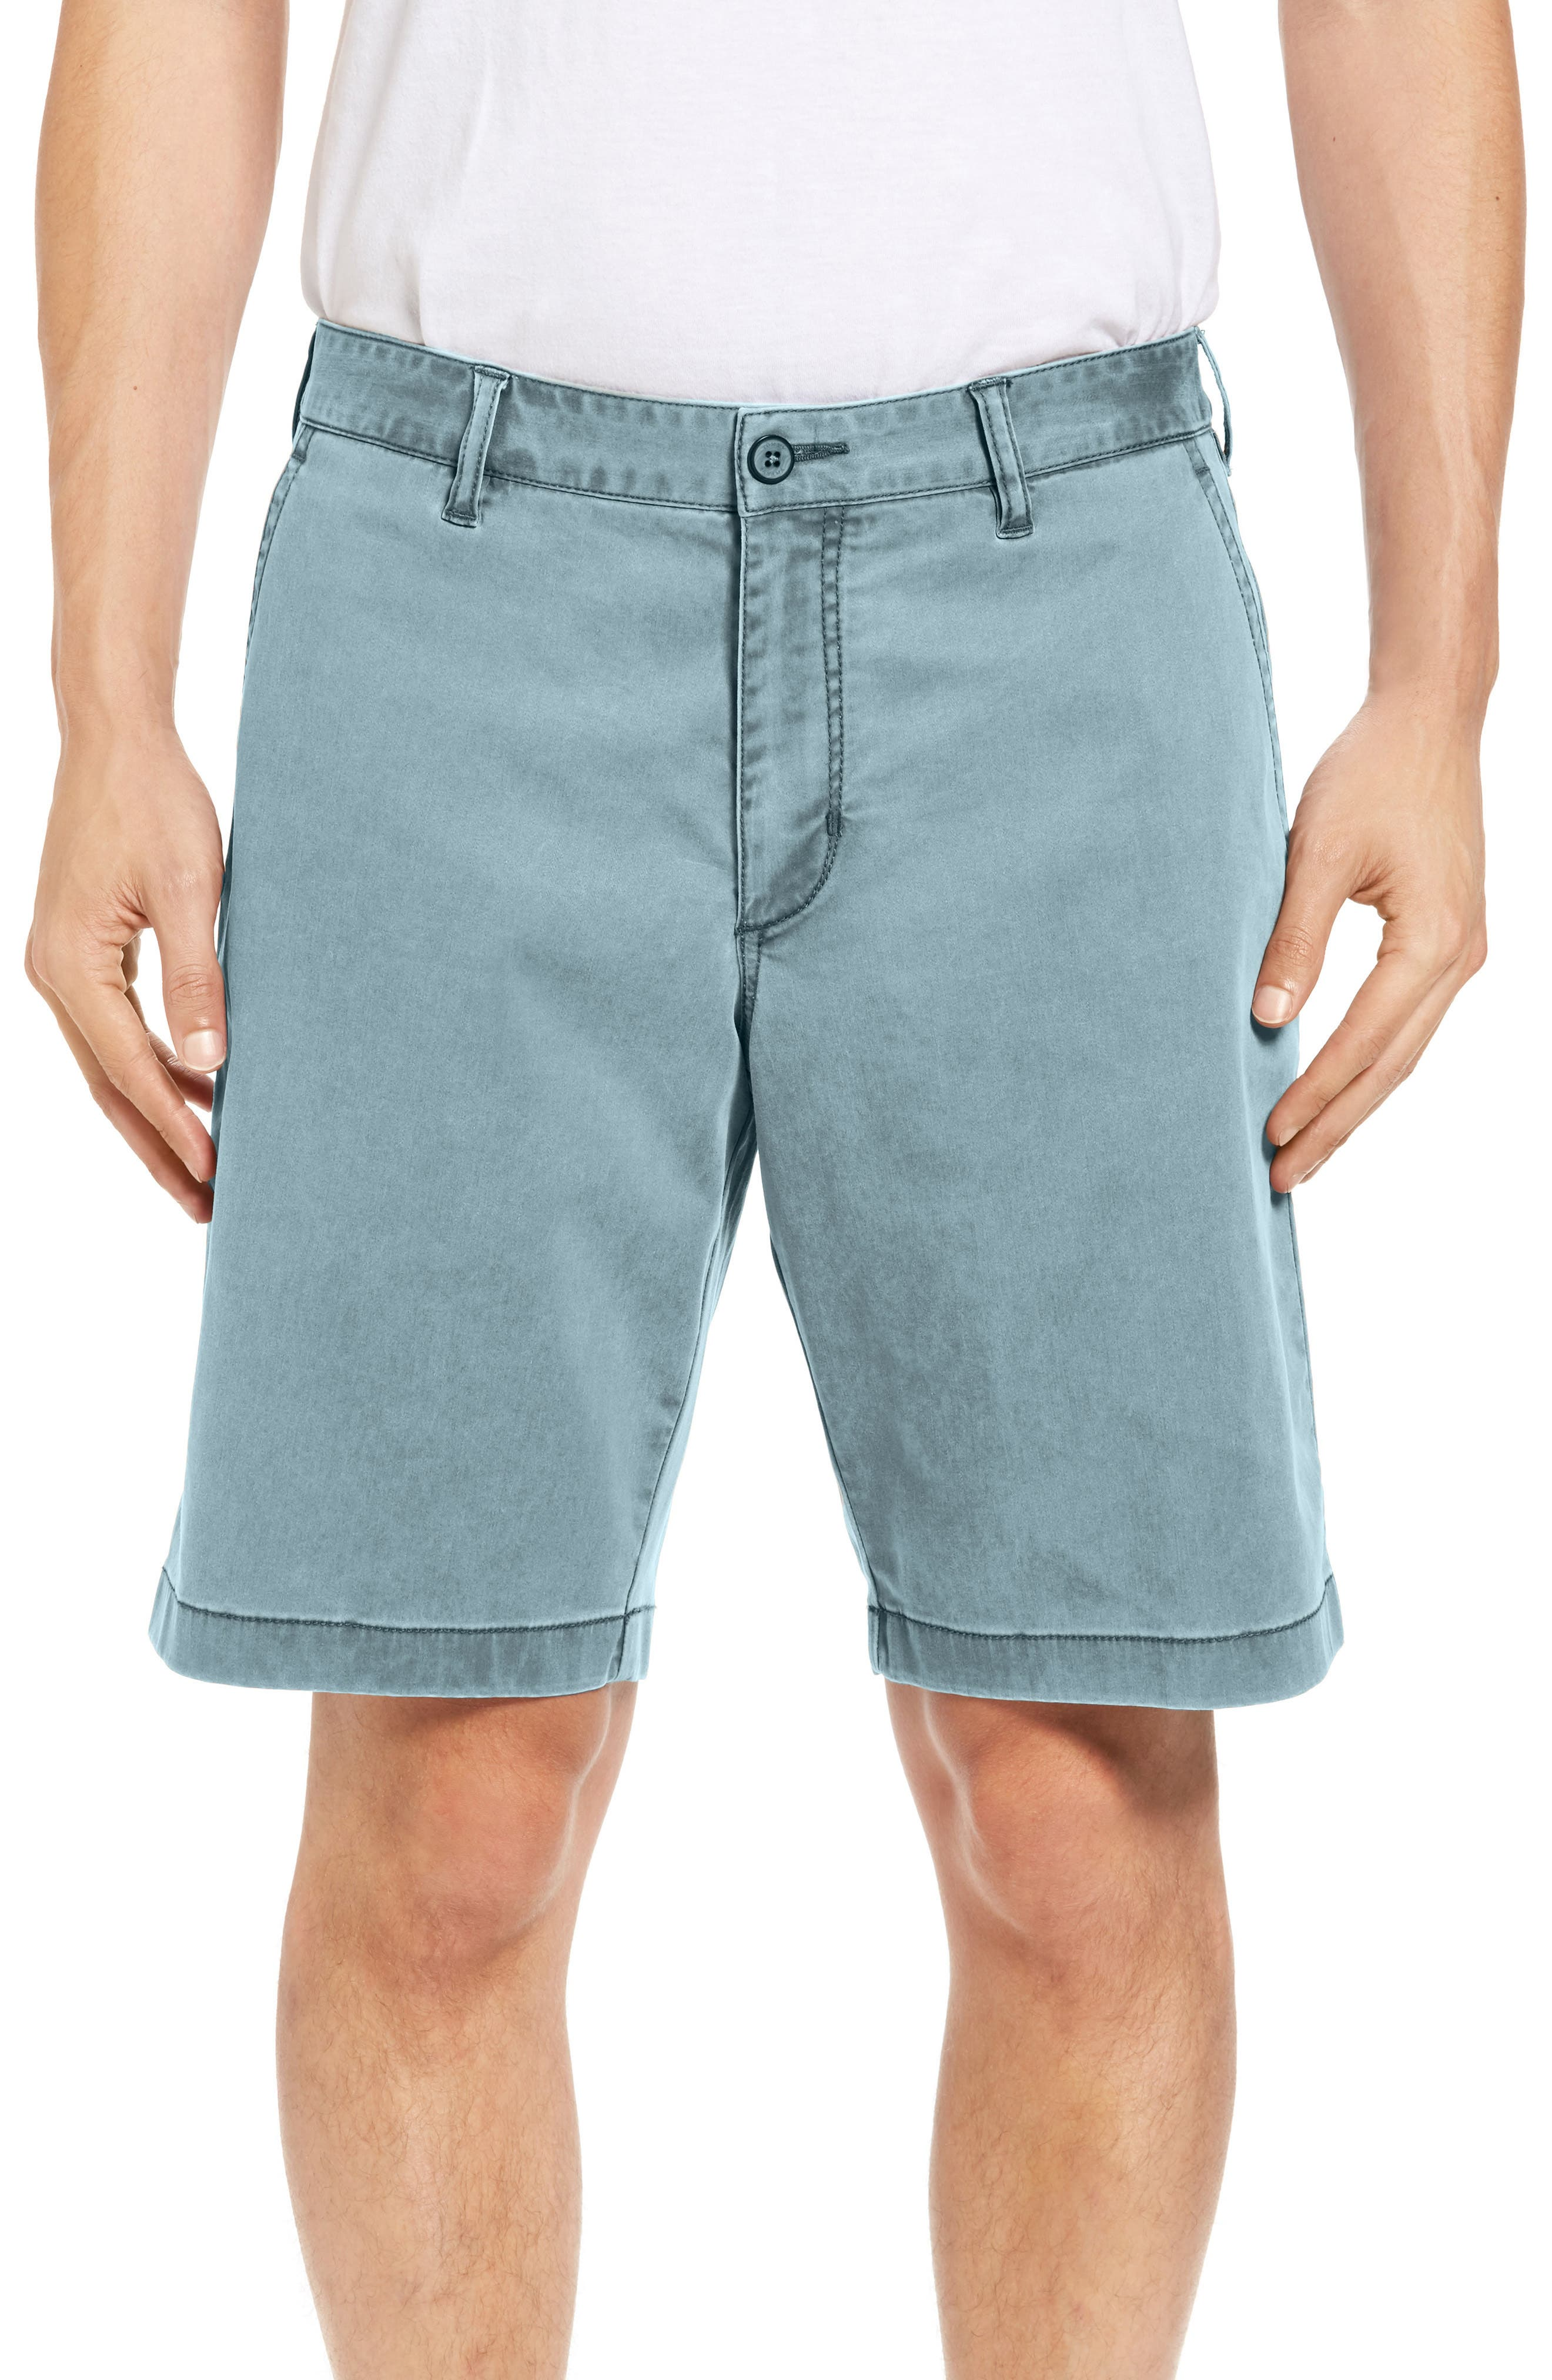 Boracay Shorts,                         Main,                         color, Dk Alpine